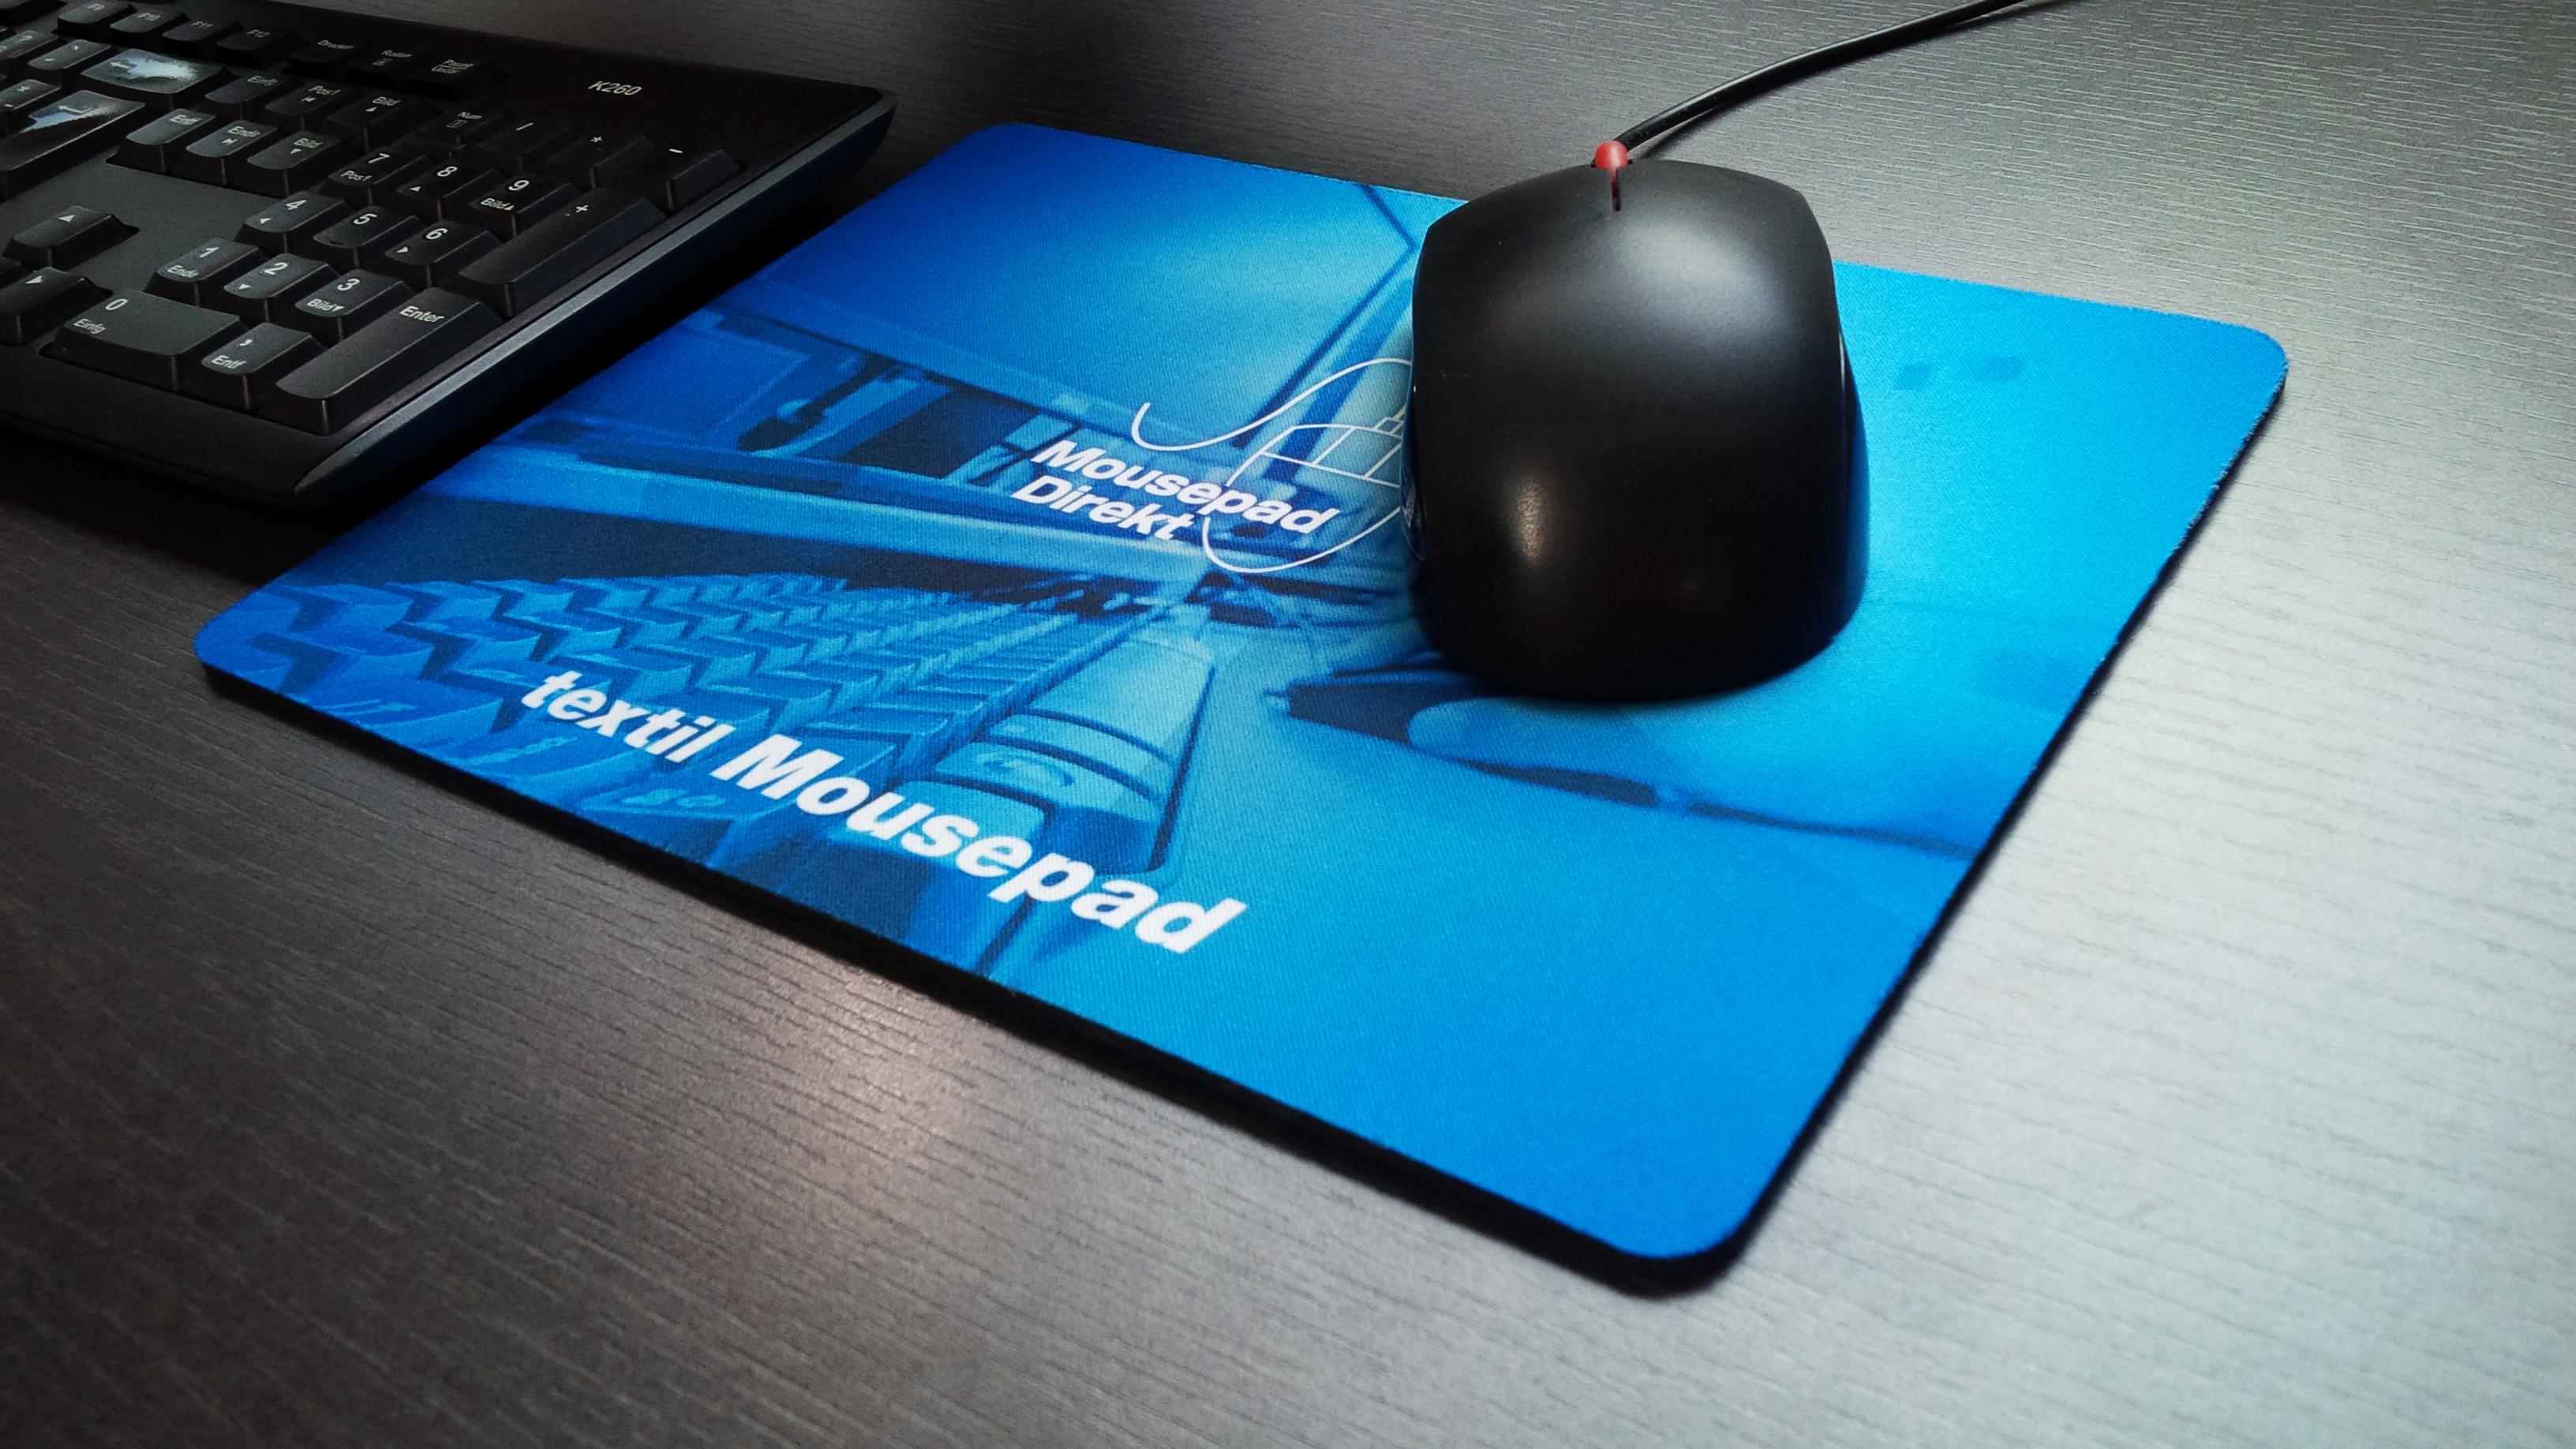 mousepads bedrucken lassen schnelle lieferzeit gute qualit t preiswert mousepad direkt. Black Bedroom Furniture Sets. Home Design Ideas